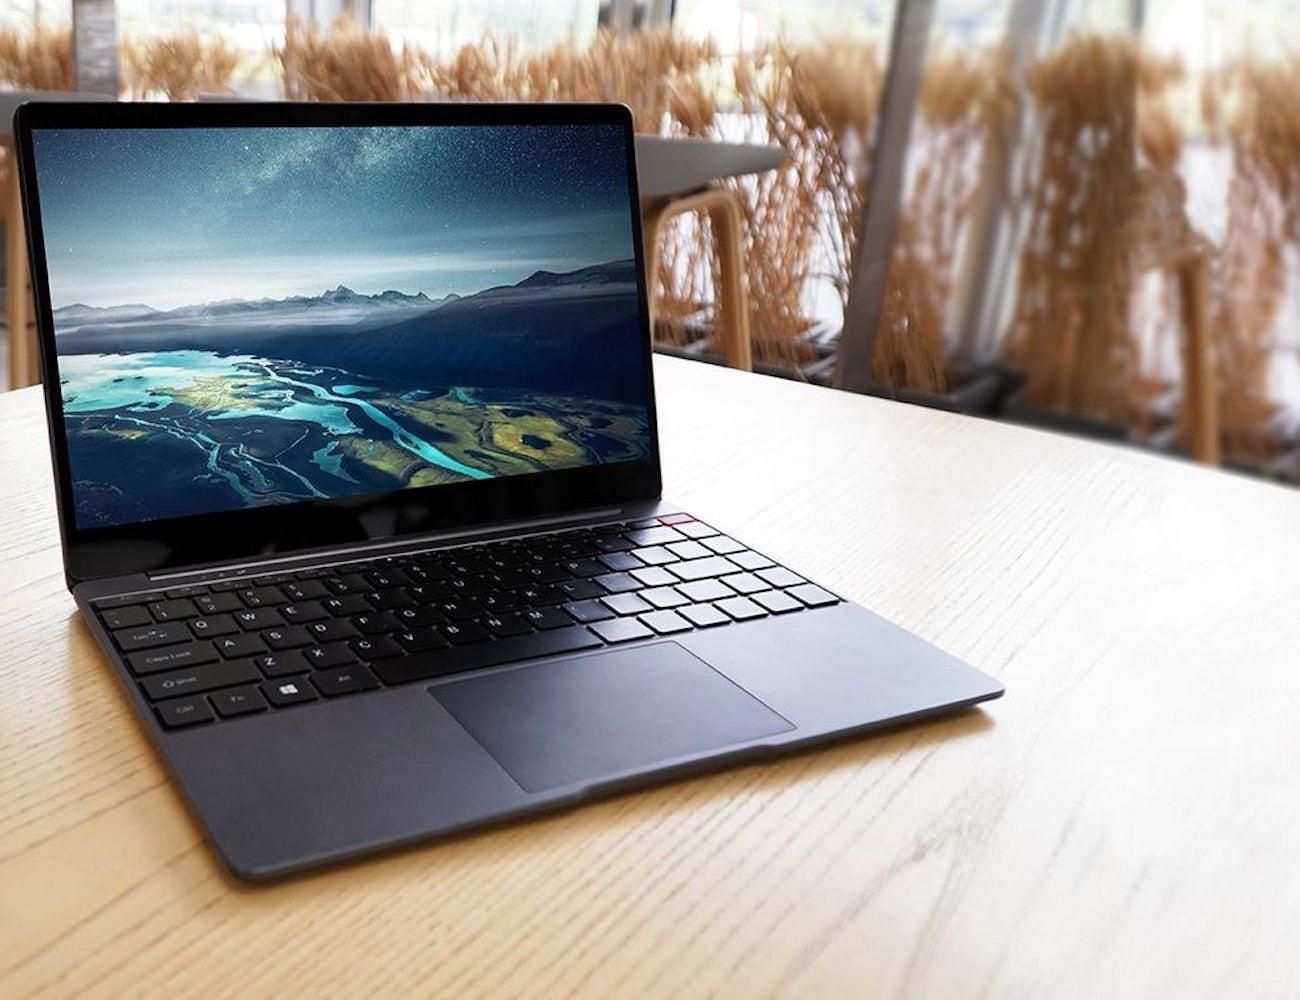 CHUWI AeroBook Bezel-Less Widescreen Laptop has an 80% screen ratio